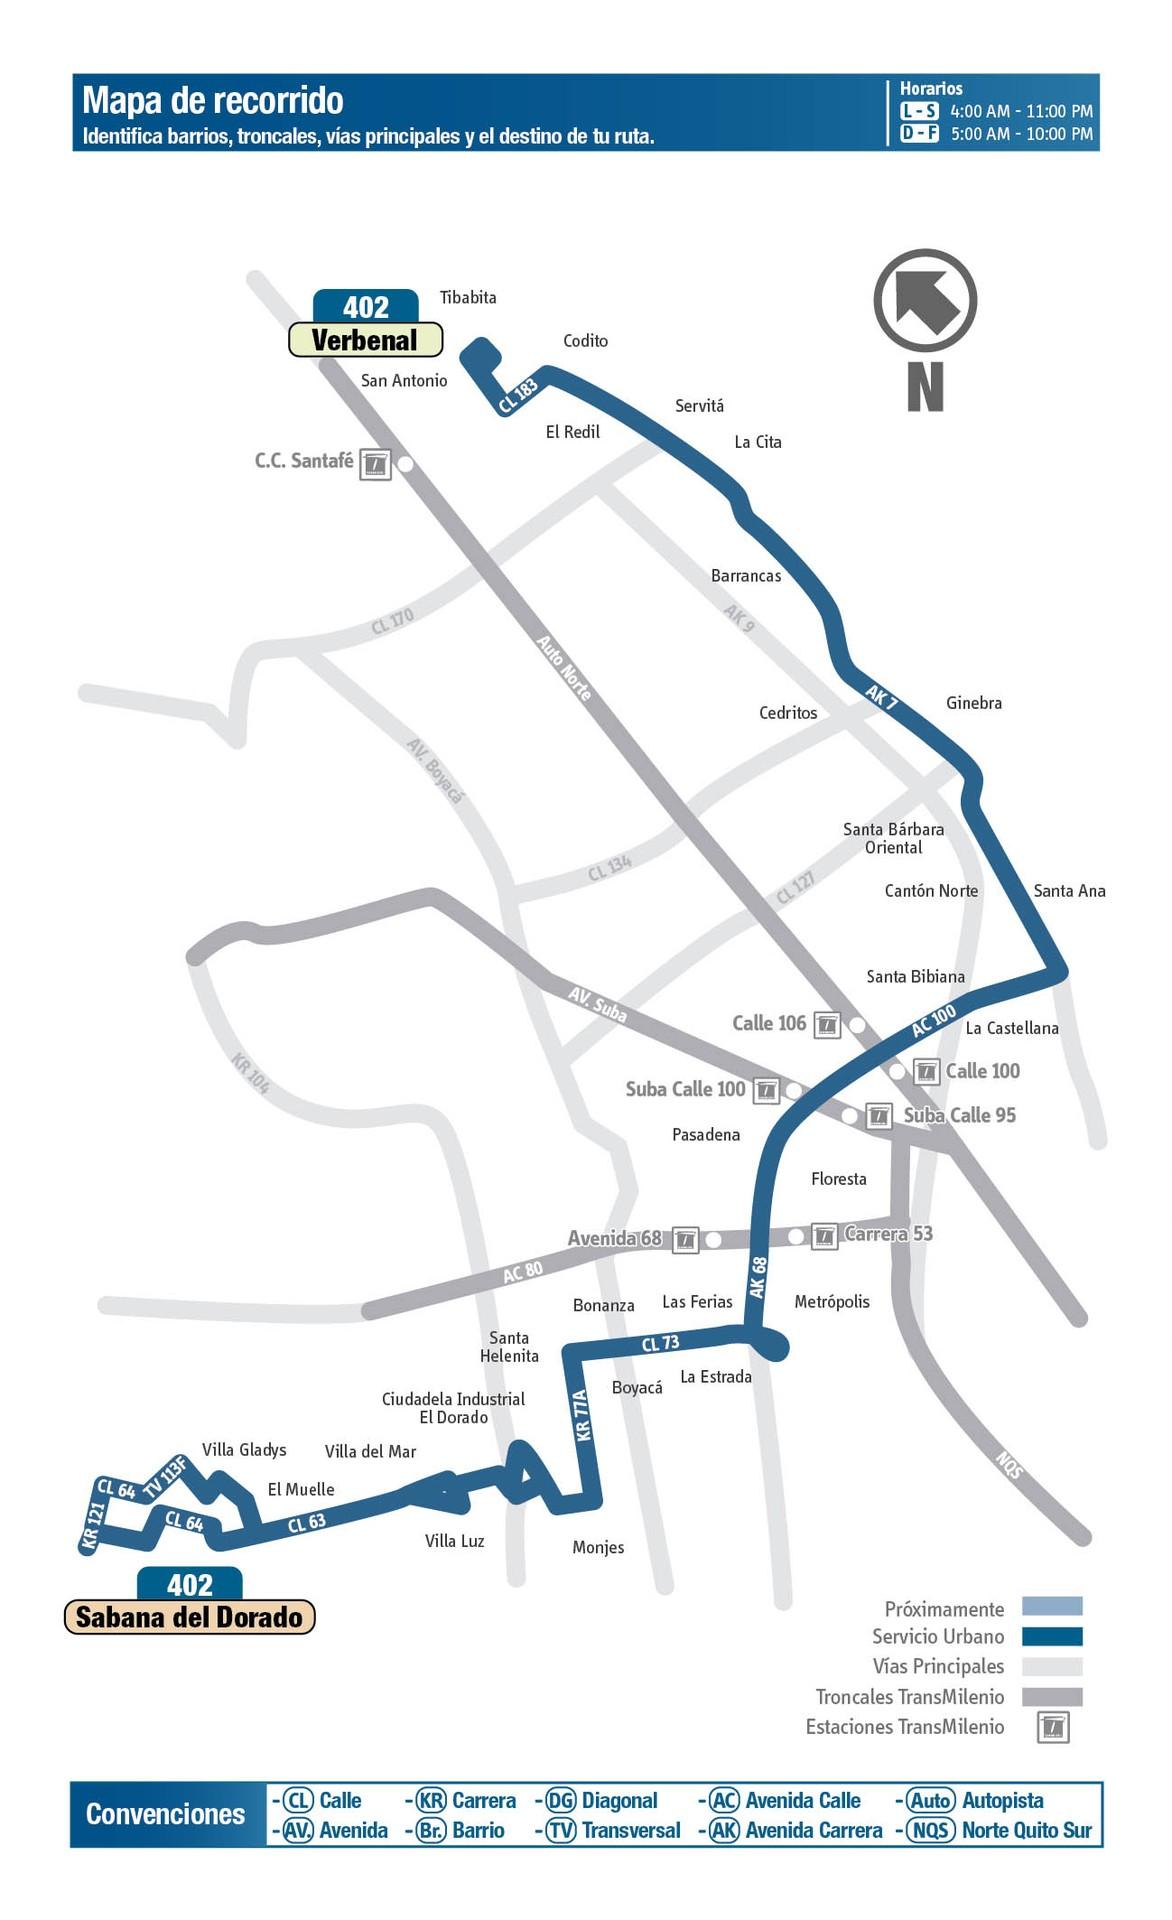 Ruta SITP: 402 Verbenal ↔ Sabana del Dorado [Urbana] 4